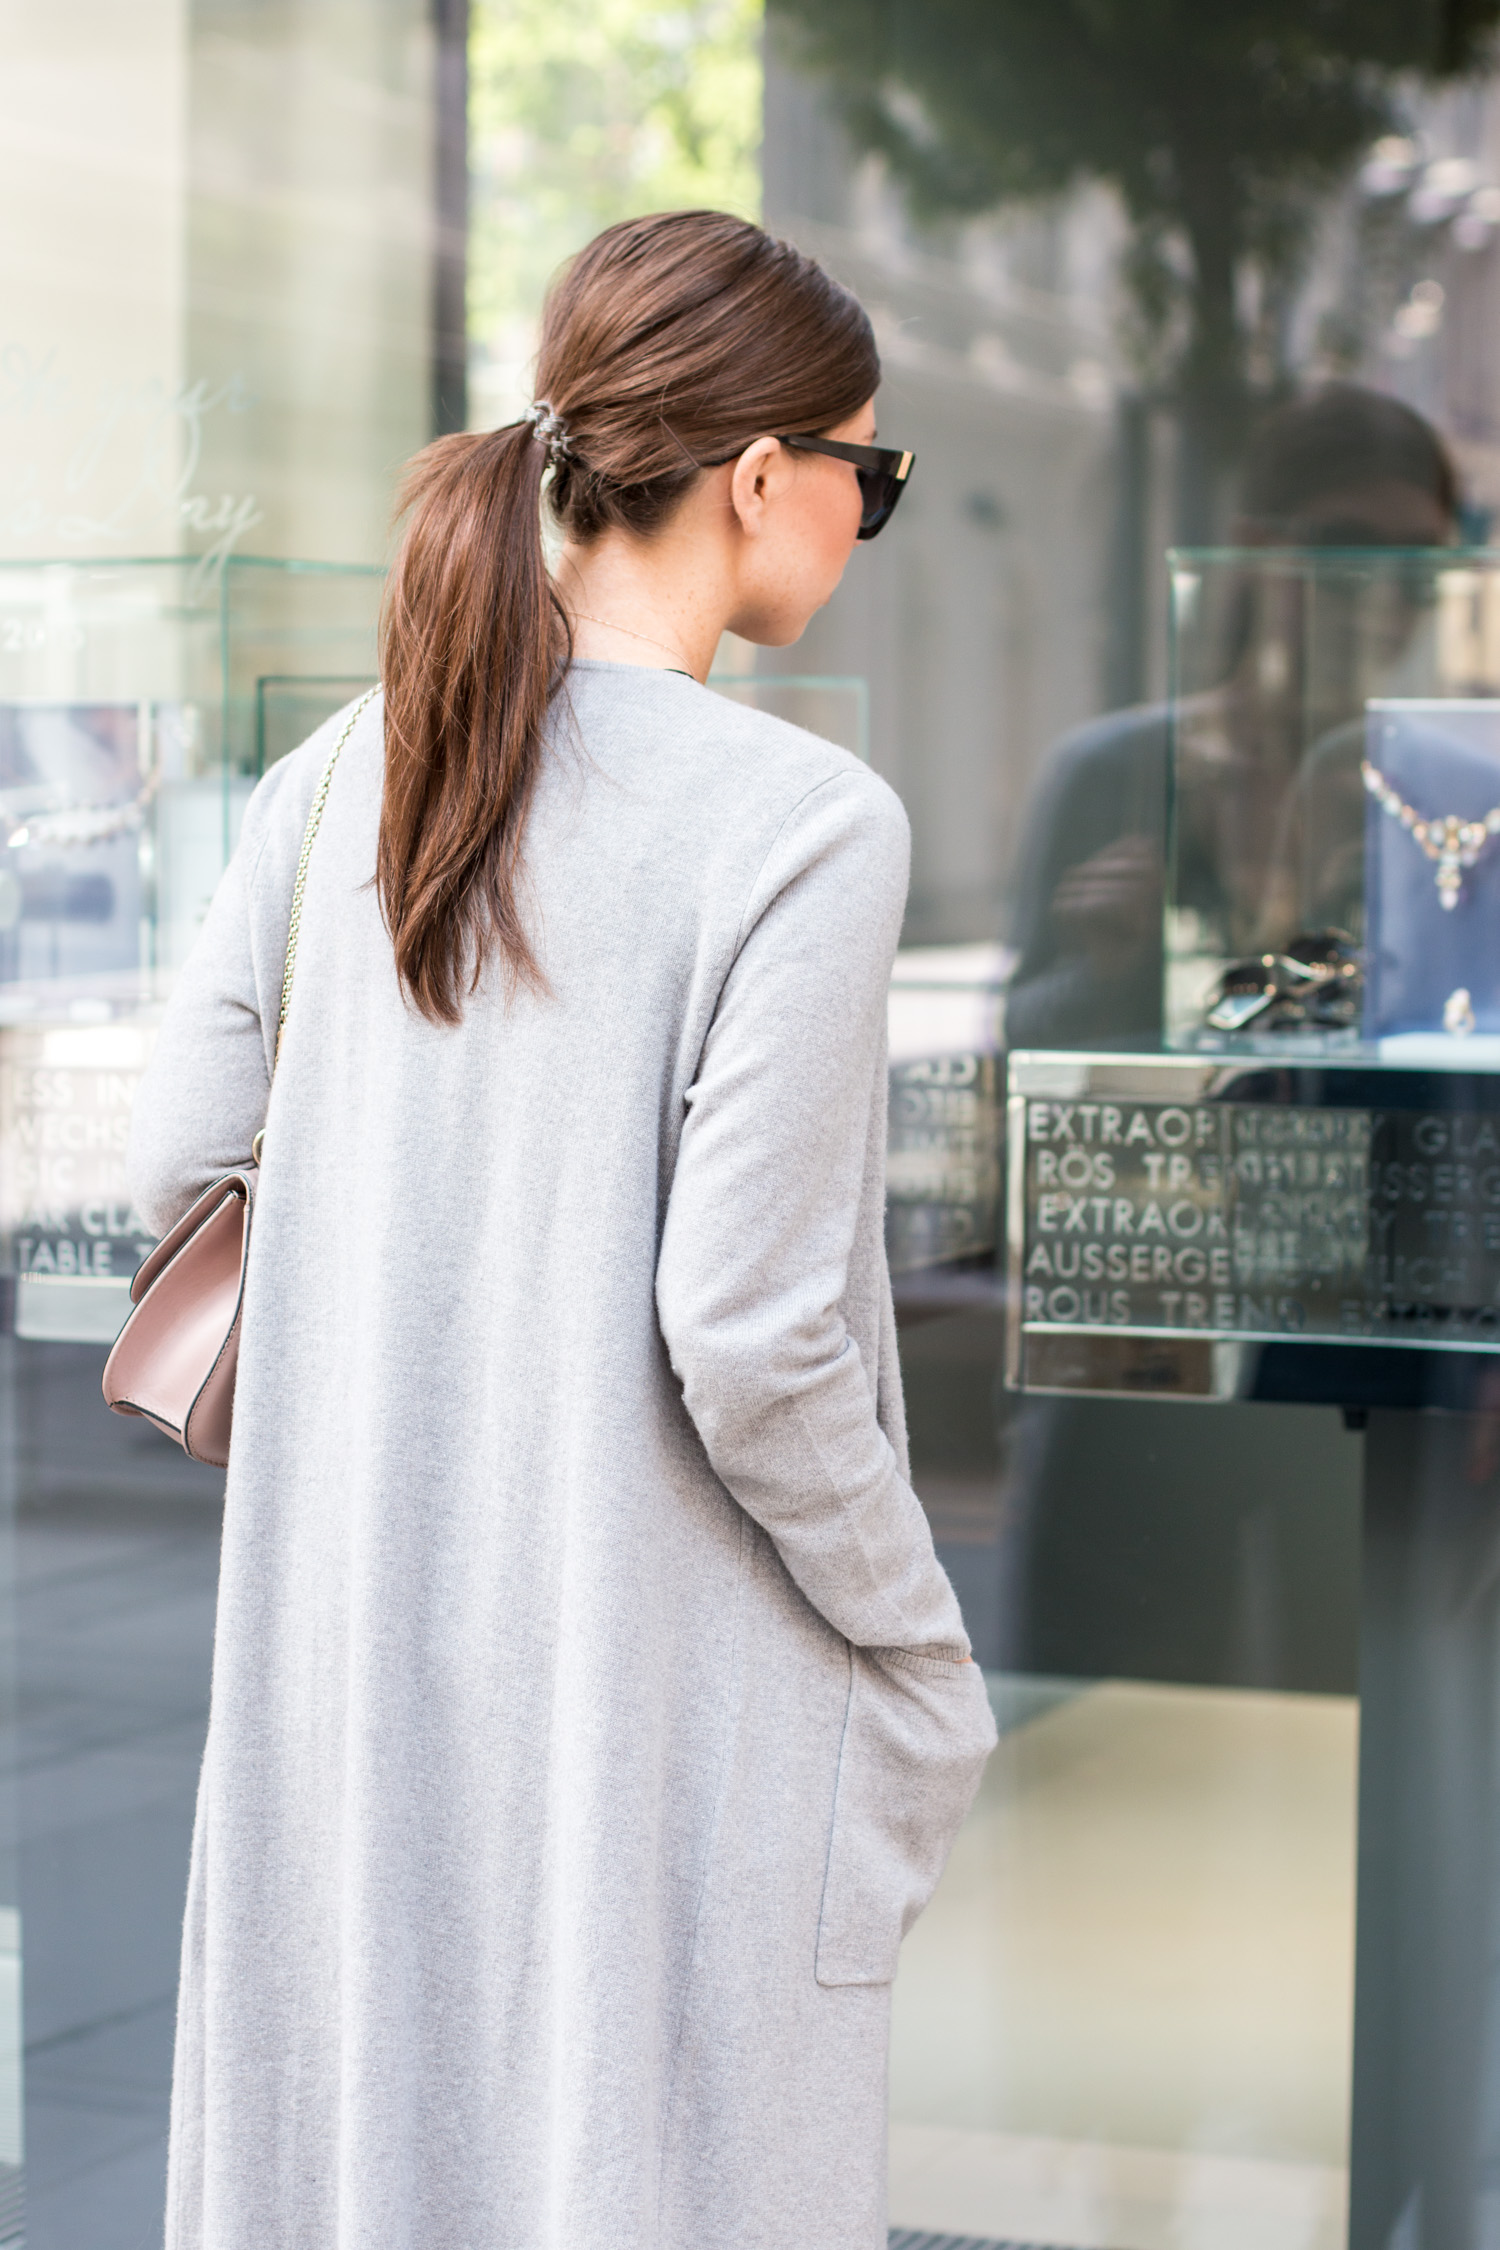 Vienna Picks: Swarovski Kristallwelten Store, Kärntnerstraße | The Daily Dose